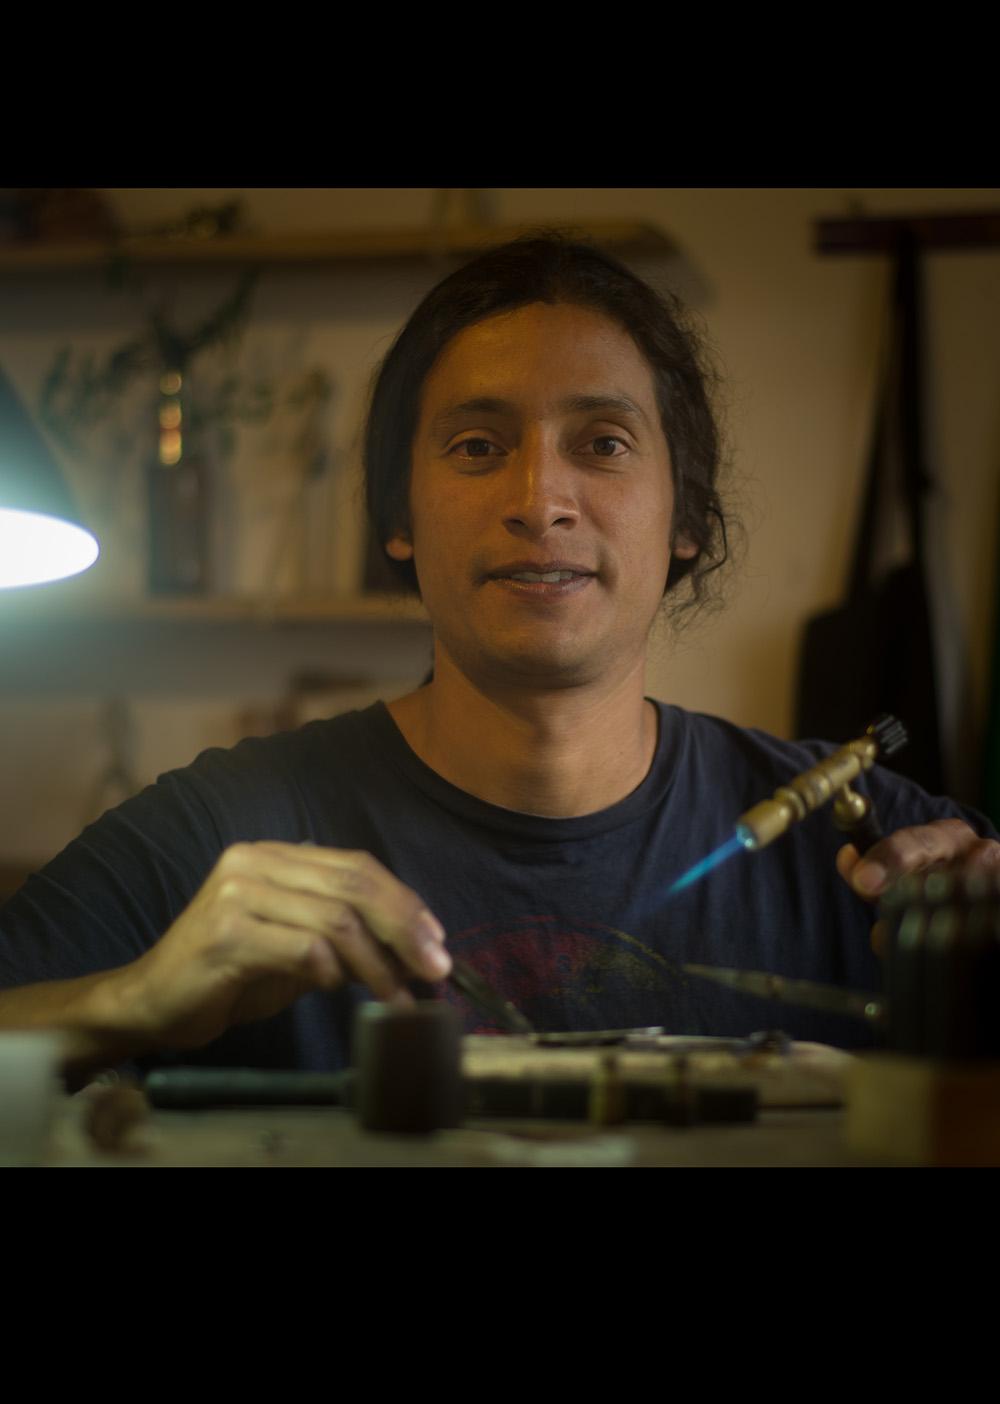 ALEXIS SUAREZ